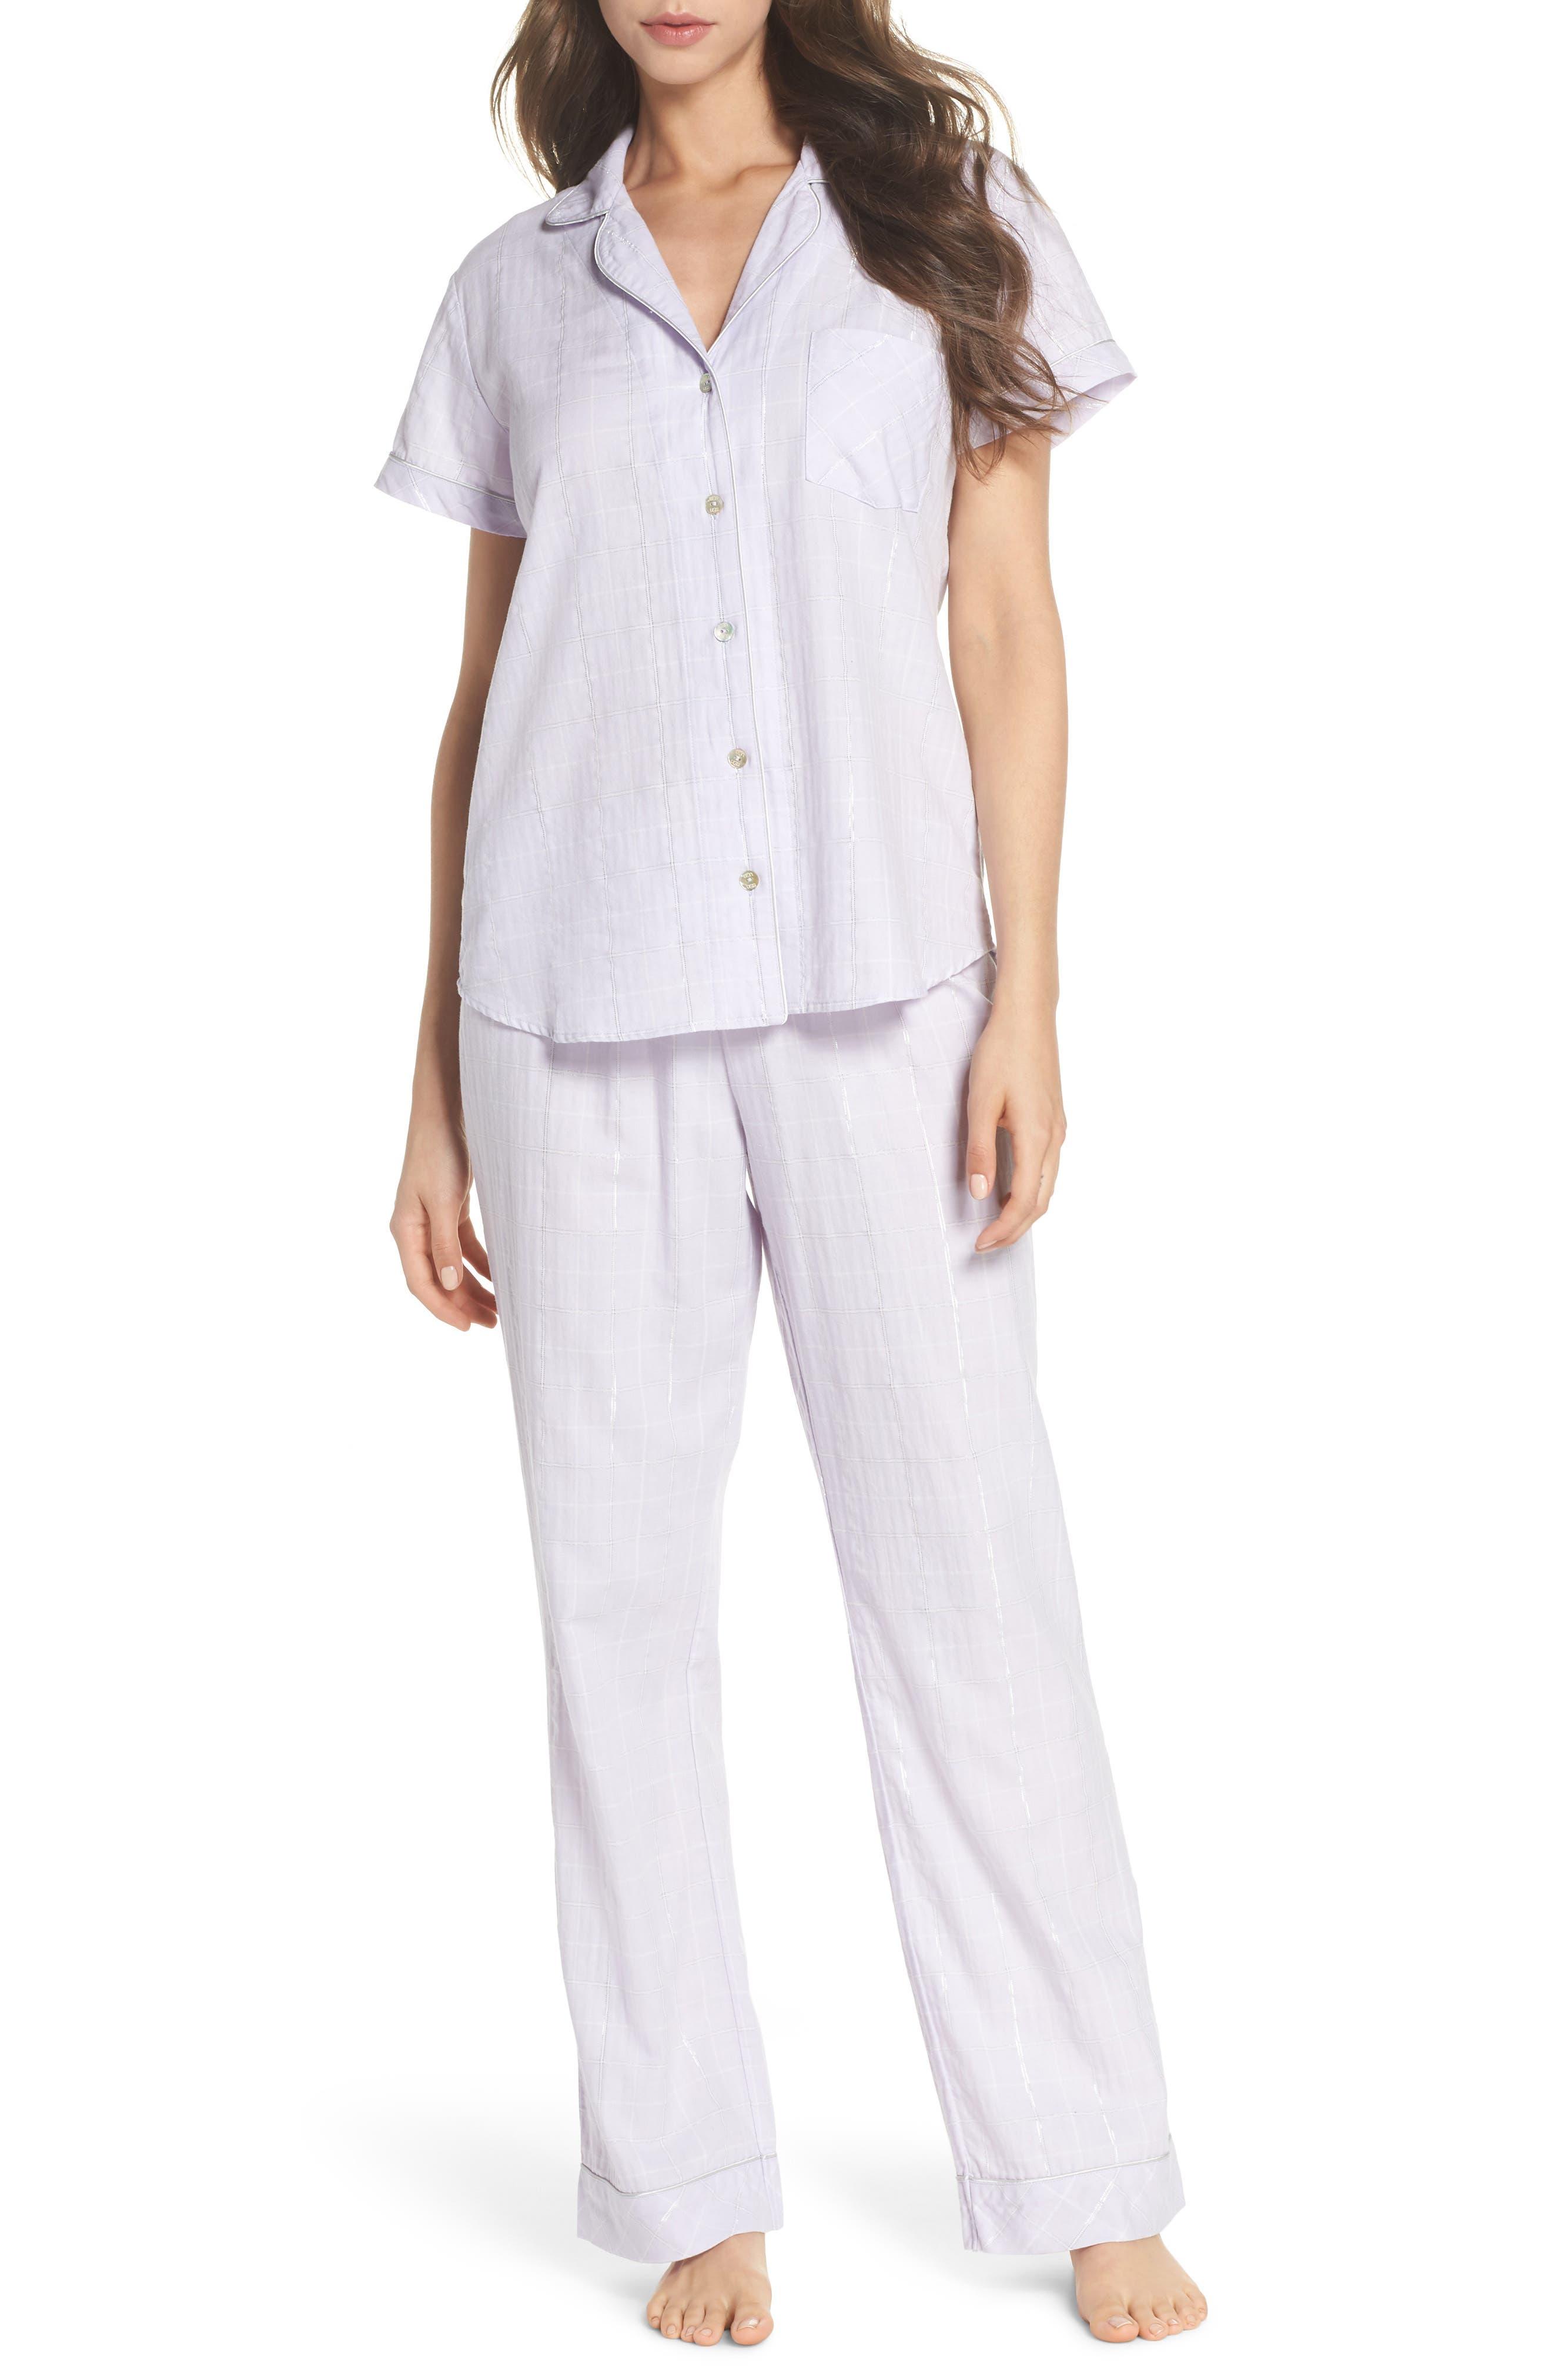 Rosan Sparkle Pajamas,                             Main thumbnail 1, color,                             538